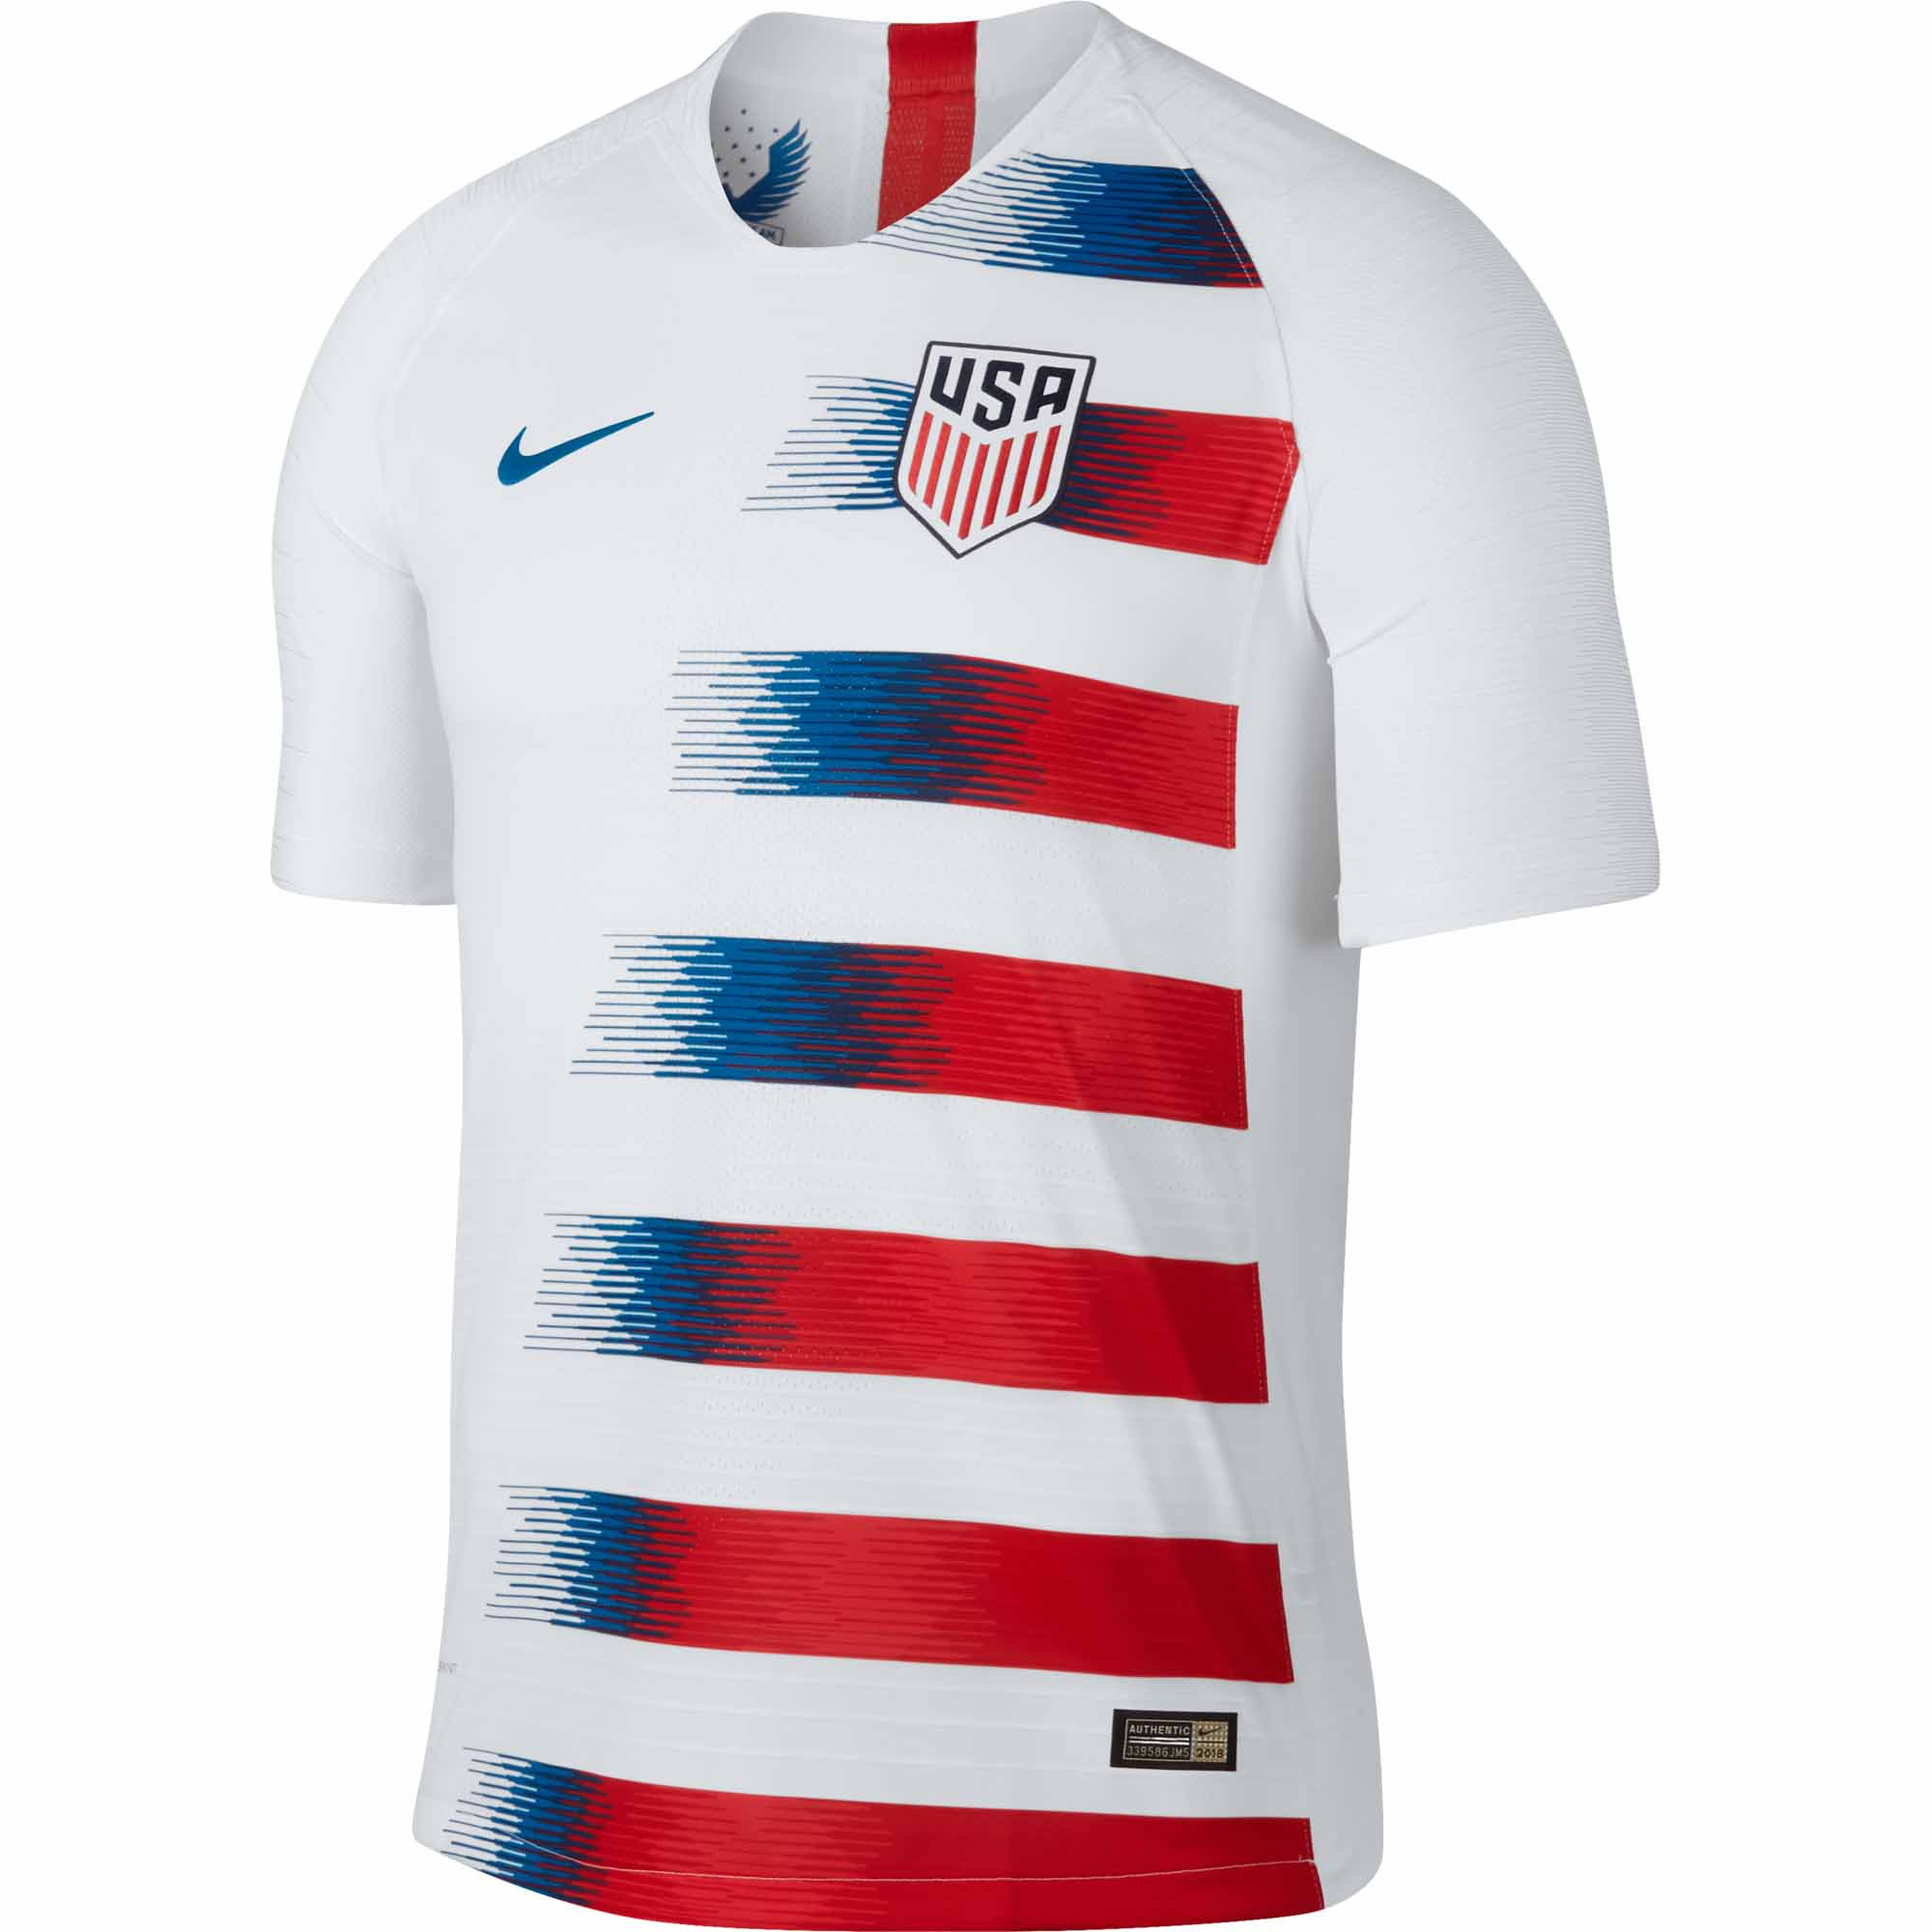 Nike USA Home Match Jersey 2018-19 - Soccer Master